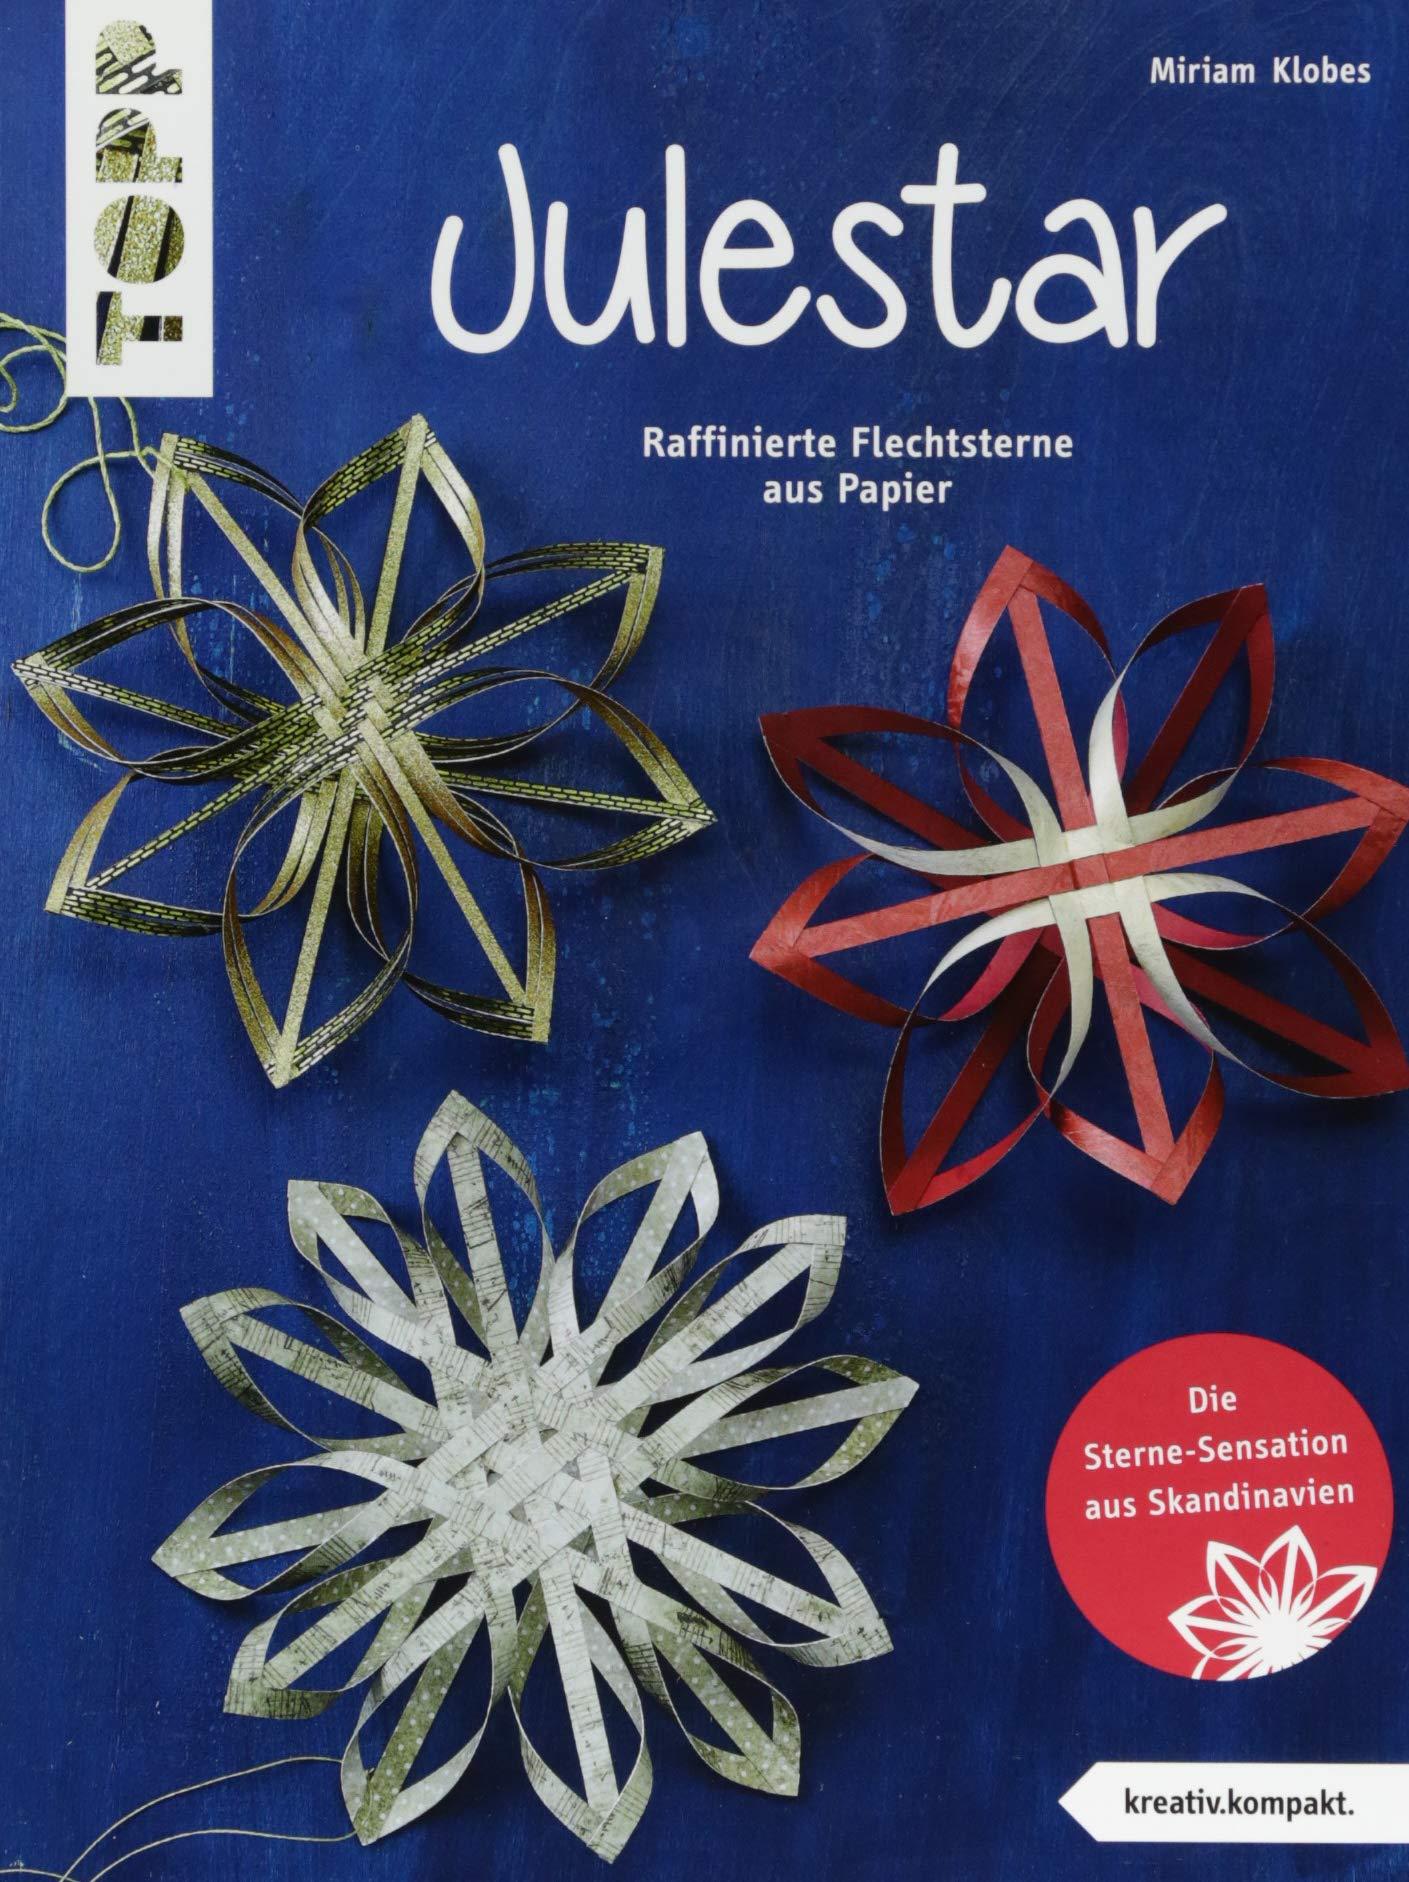 julestar-die-sterne-sensation-aus-skandinavien-kreativ-kompakt-raffinierte-flechtsterne-aus-papier